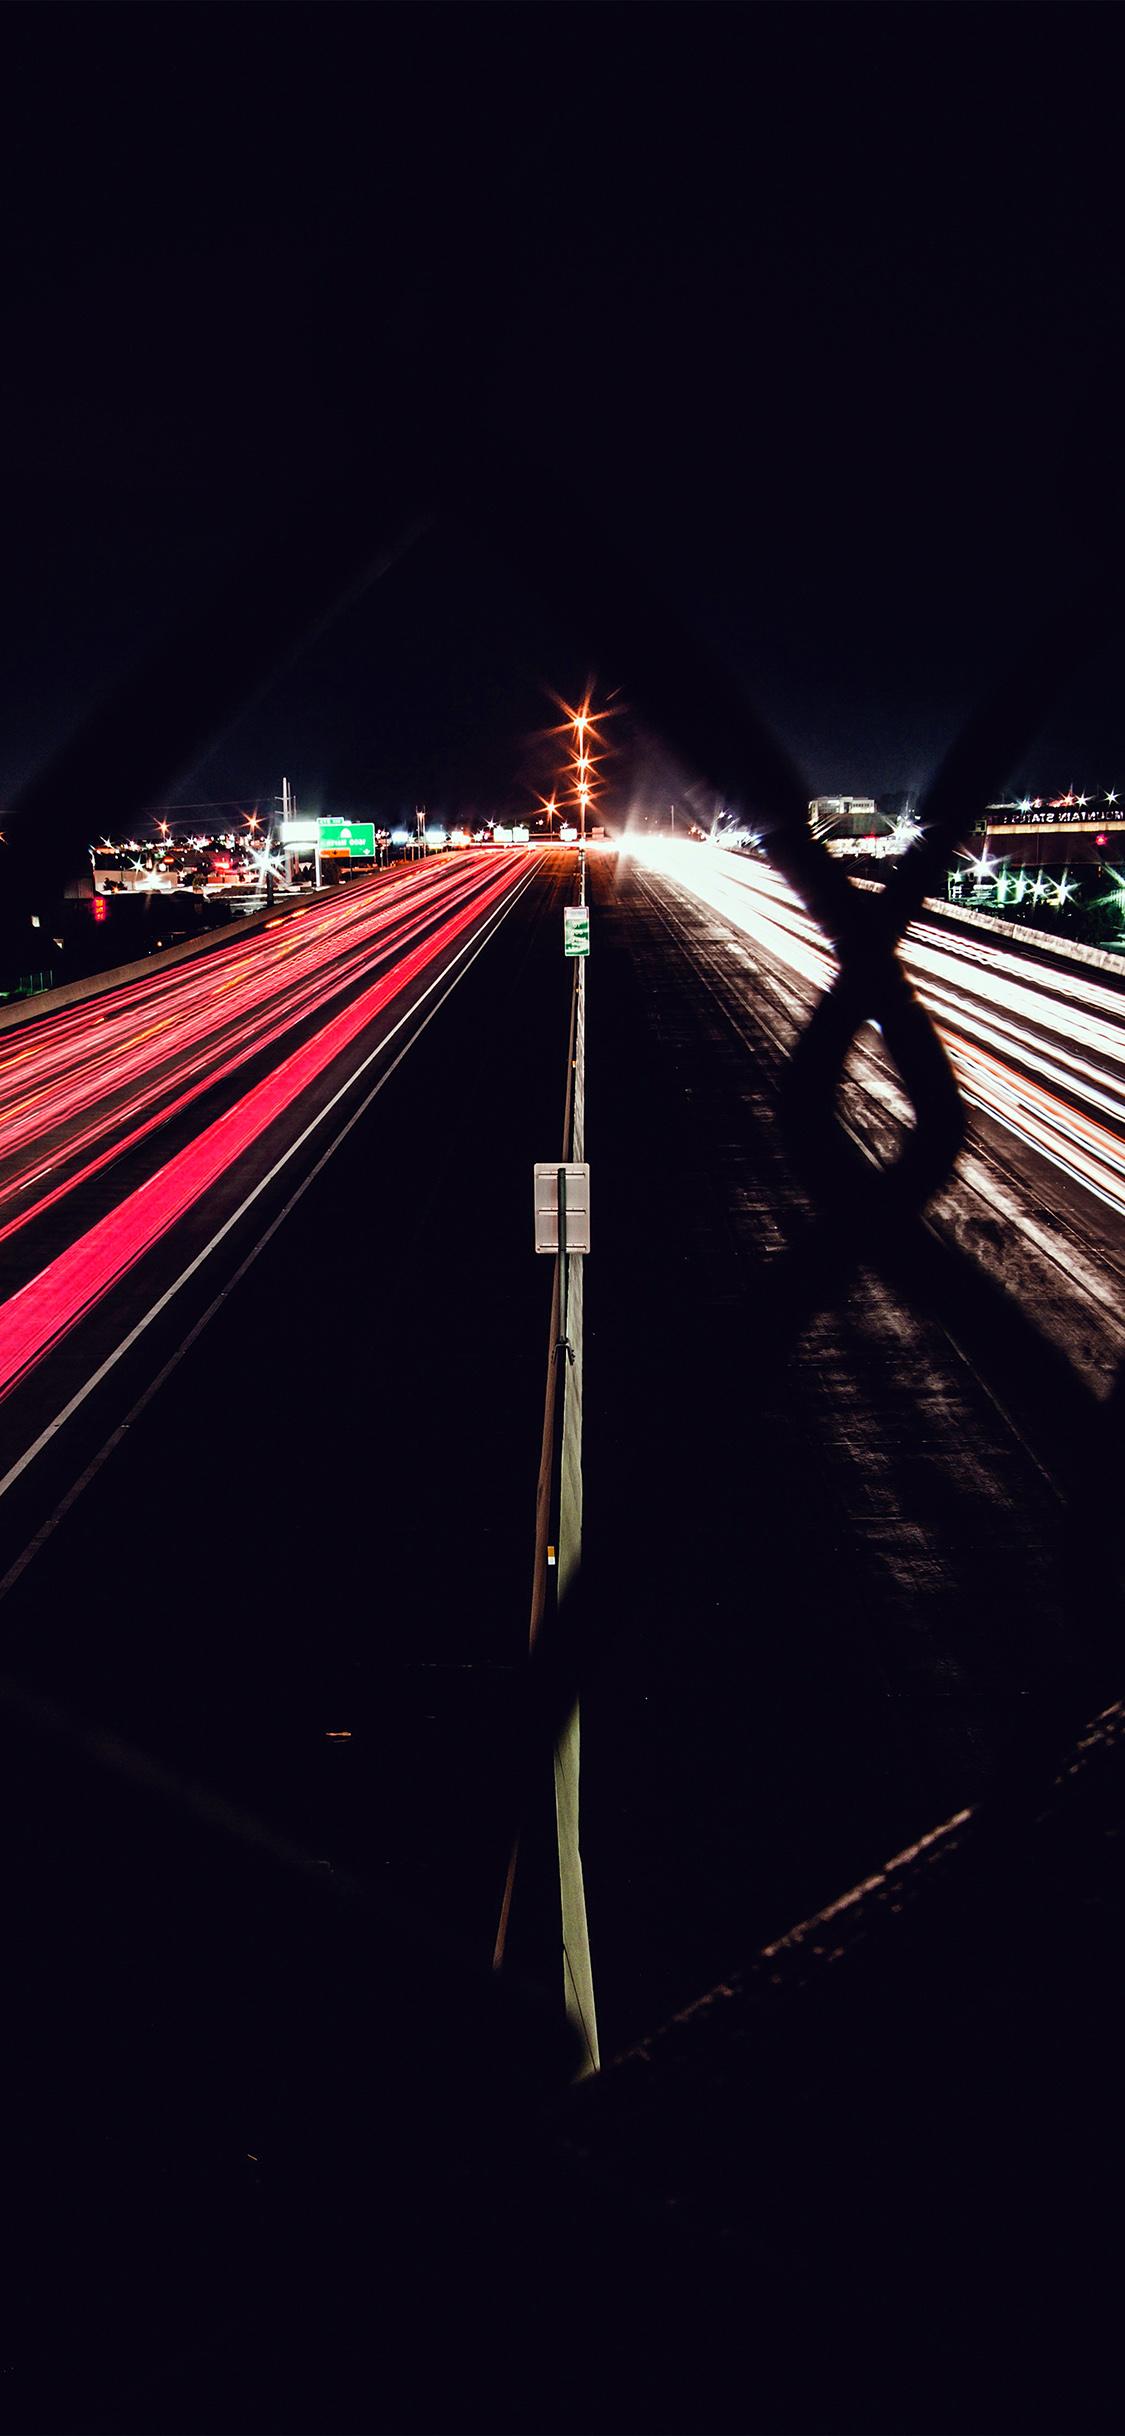 iPhonexpapers.com-Apple-iPhone-wallpaper-nj48-road-street-night-light-red-dark